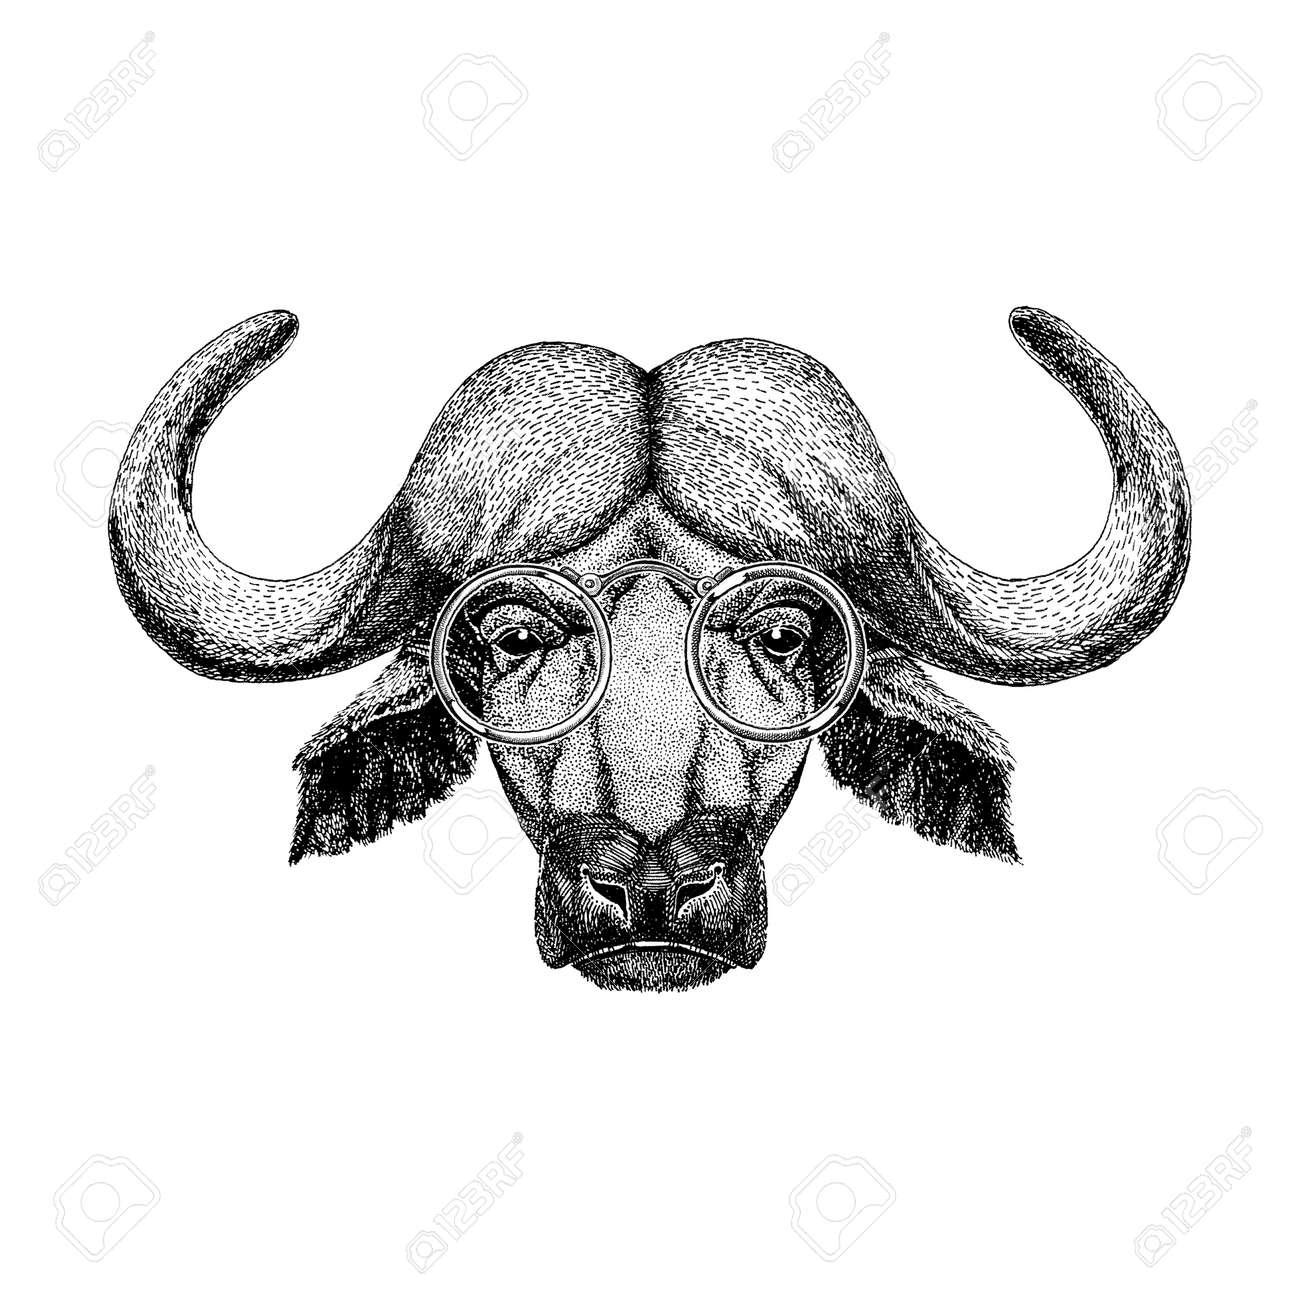 66fdb4956 Buffalo wearing glasses Image of bison, bull, buffalo for tattoo, , emblem,